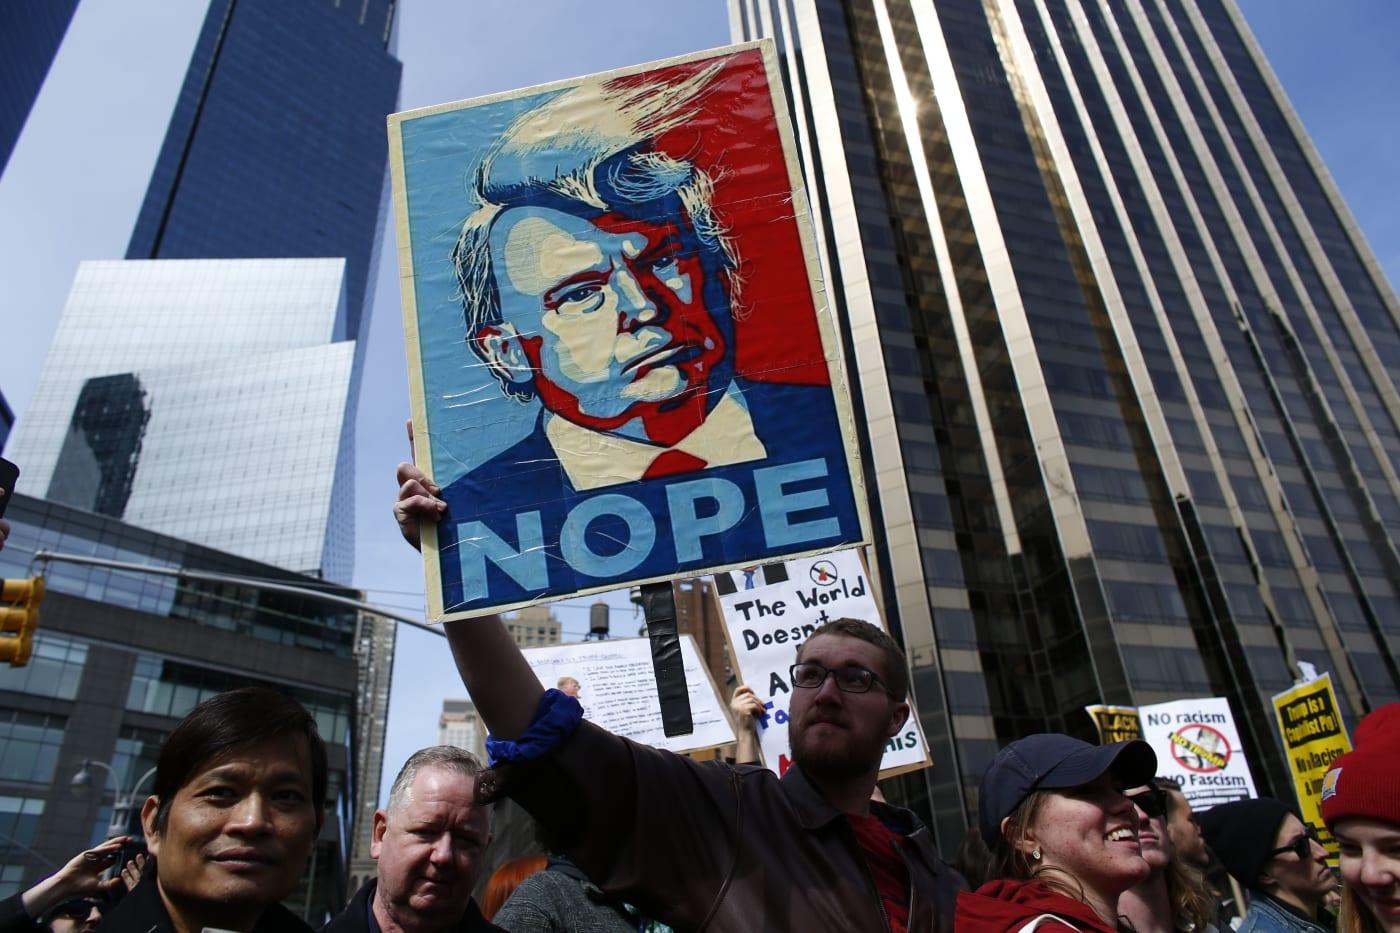 Trump Protest Sign 2